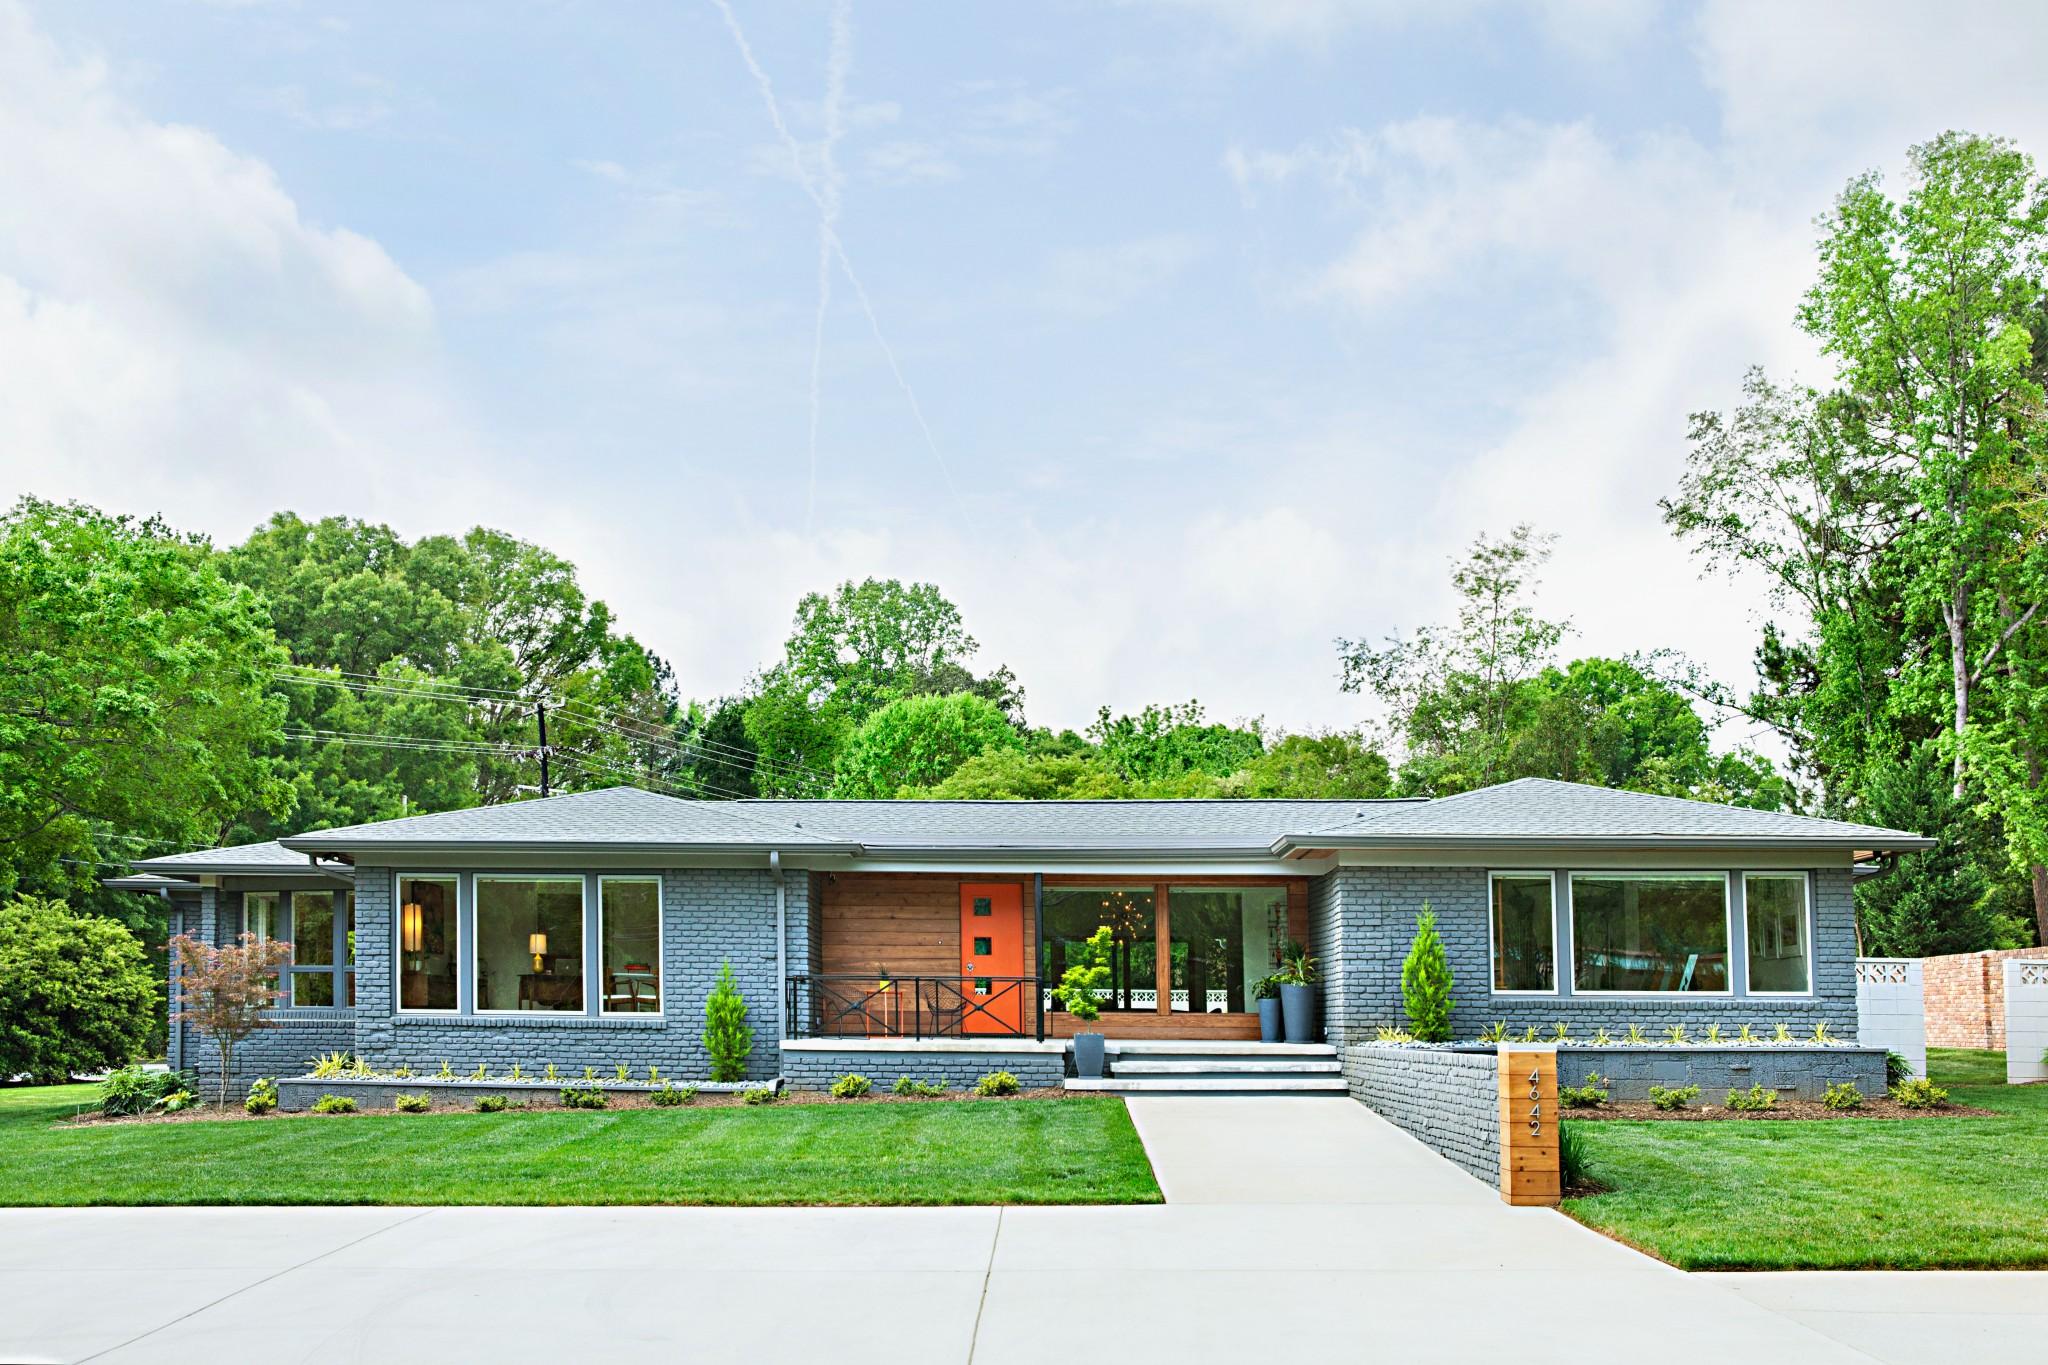 North Carolina Blue home exterior with mid mod details